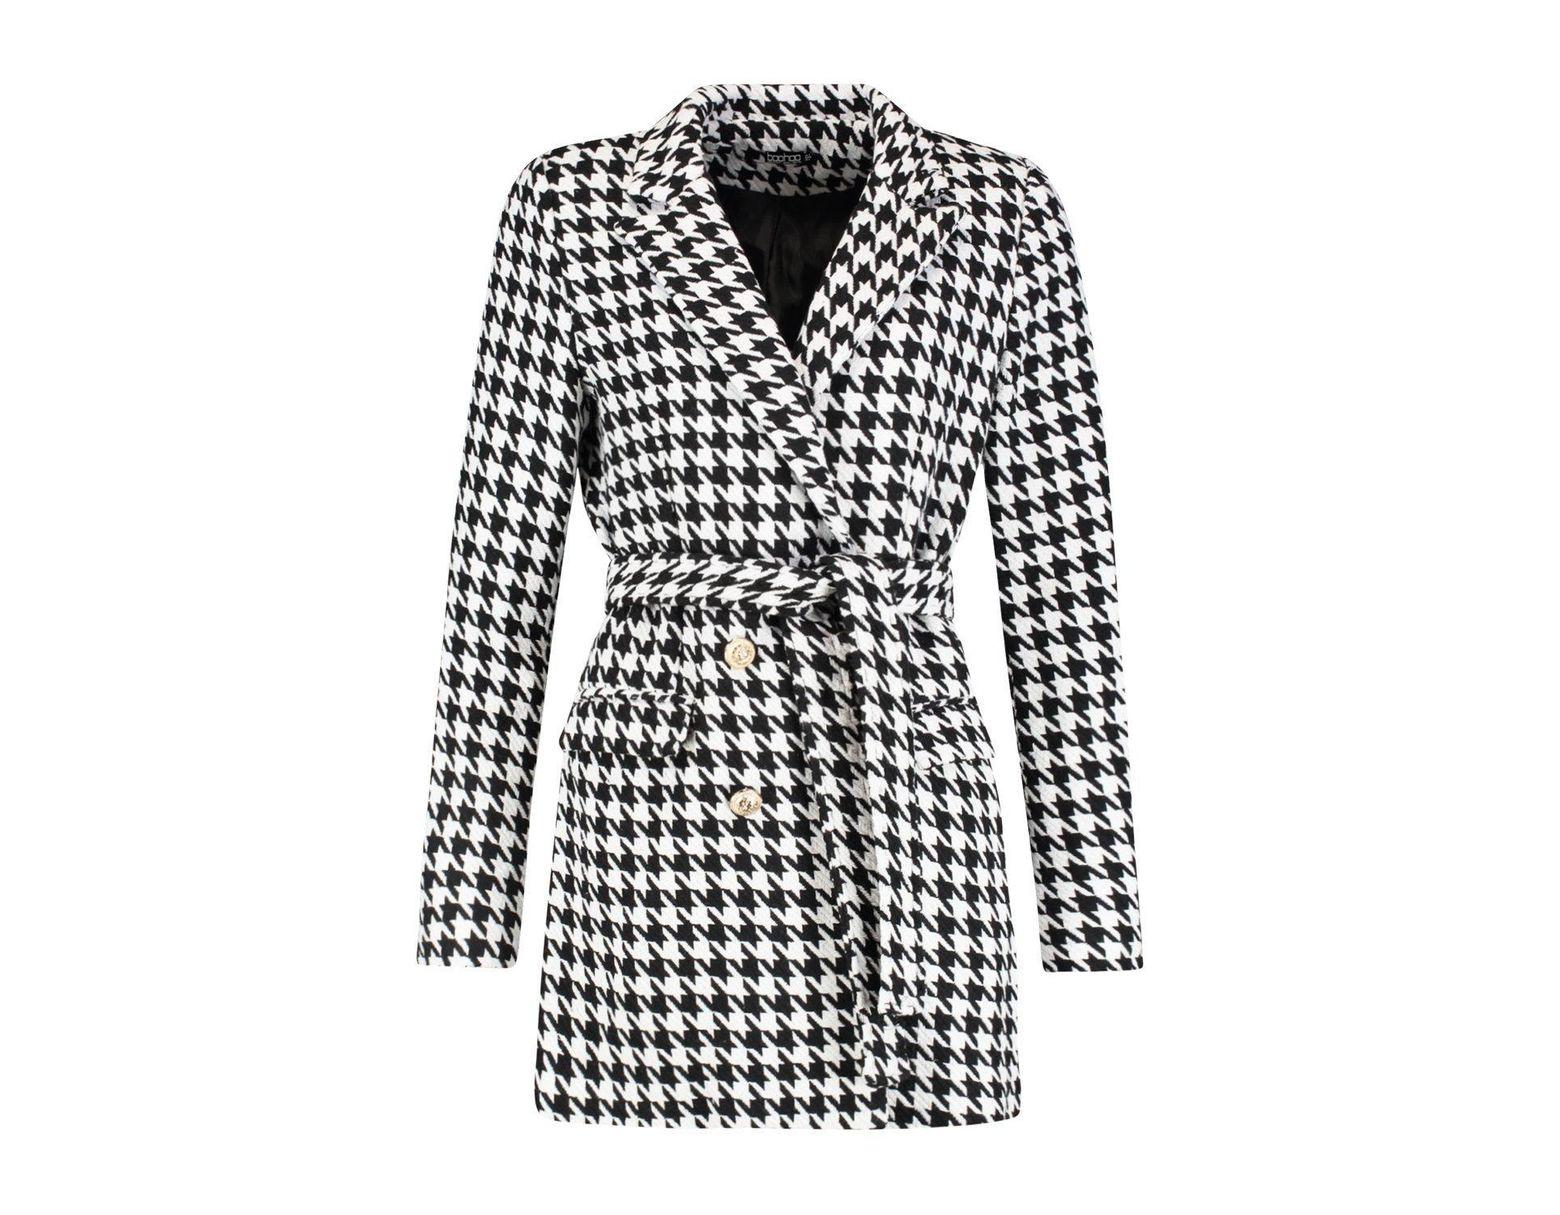 3713ab68f8e5 Boohoo Heavy Tweed Effect Tailored Blazer Dress in Black - Lyst